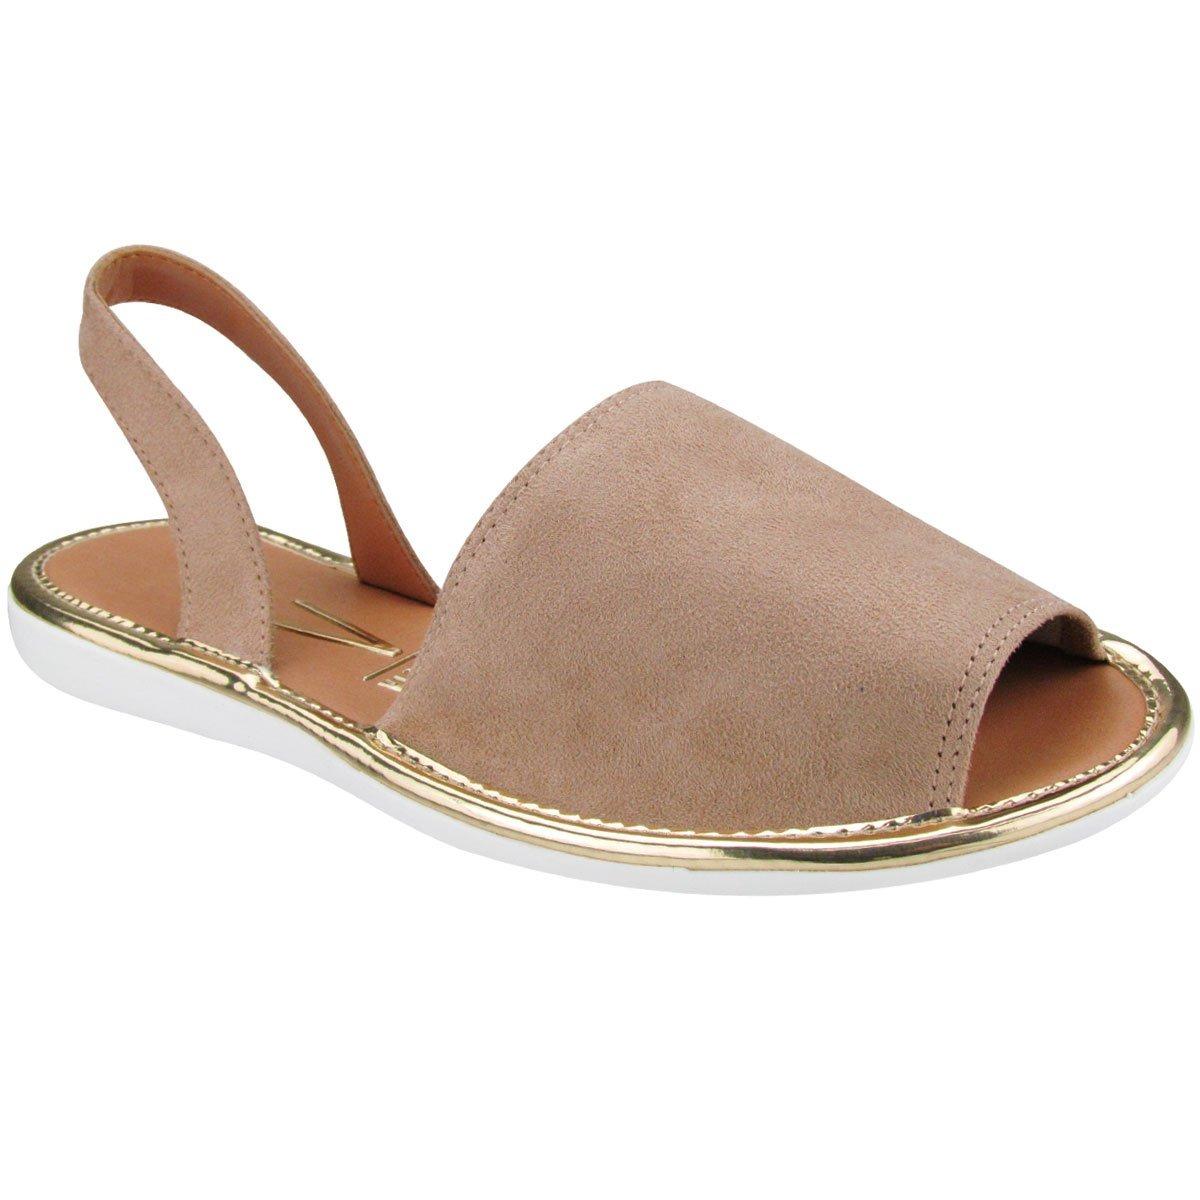 e31ebf5629 sandália feminina vizzano rasteira avarca bege 6280100. Carregando zoom.